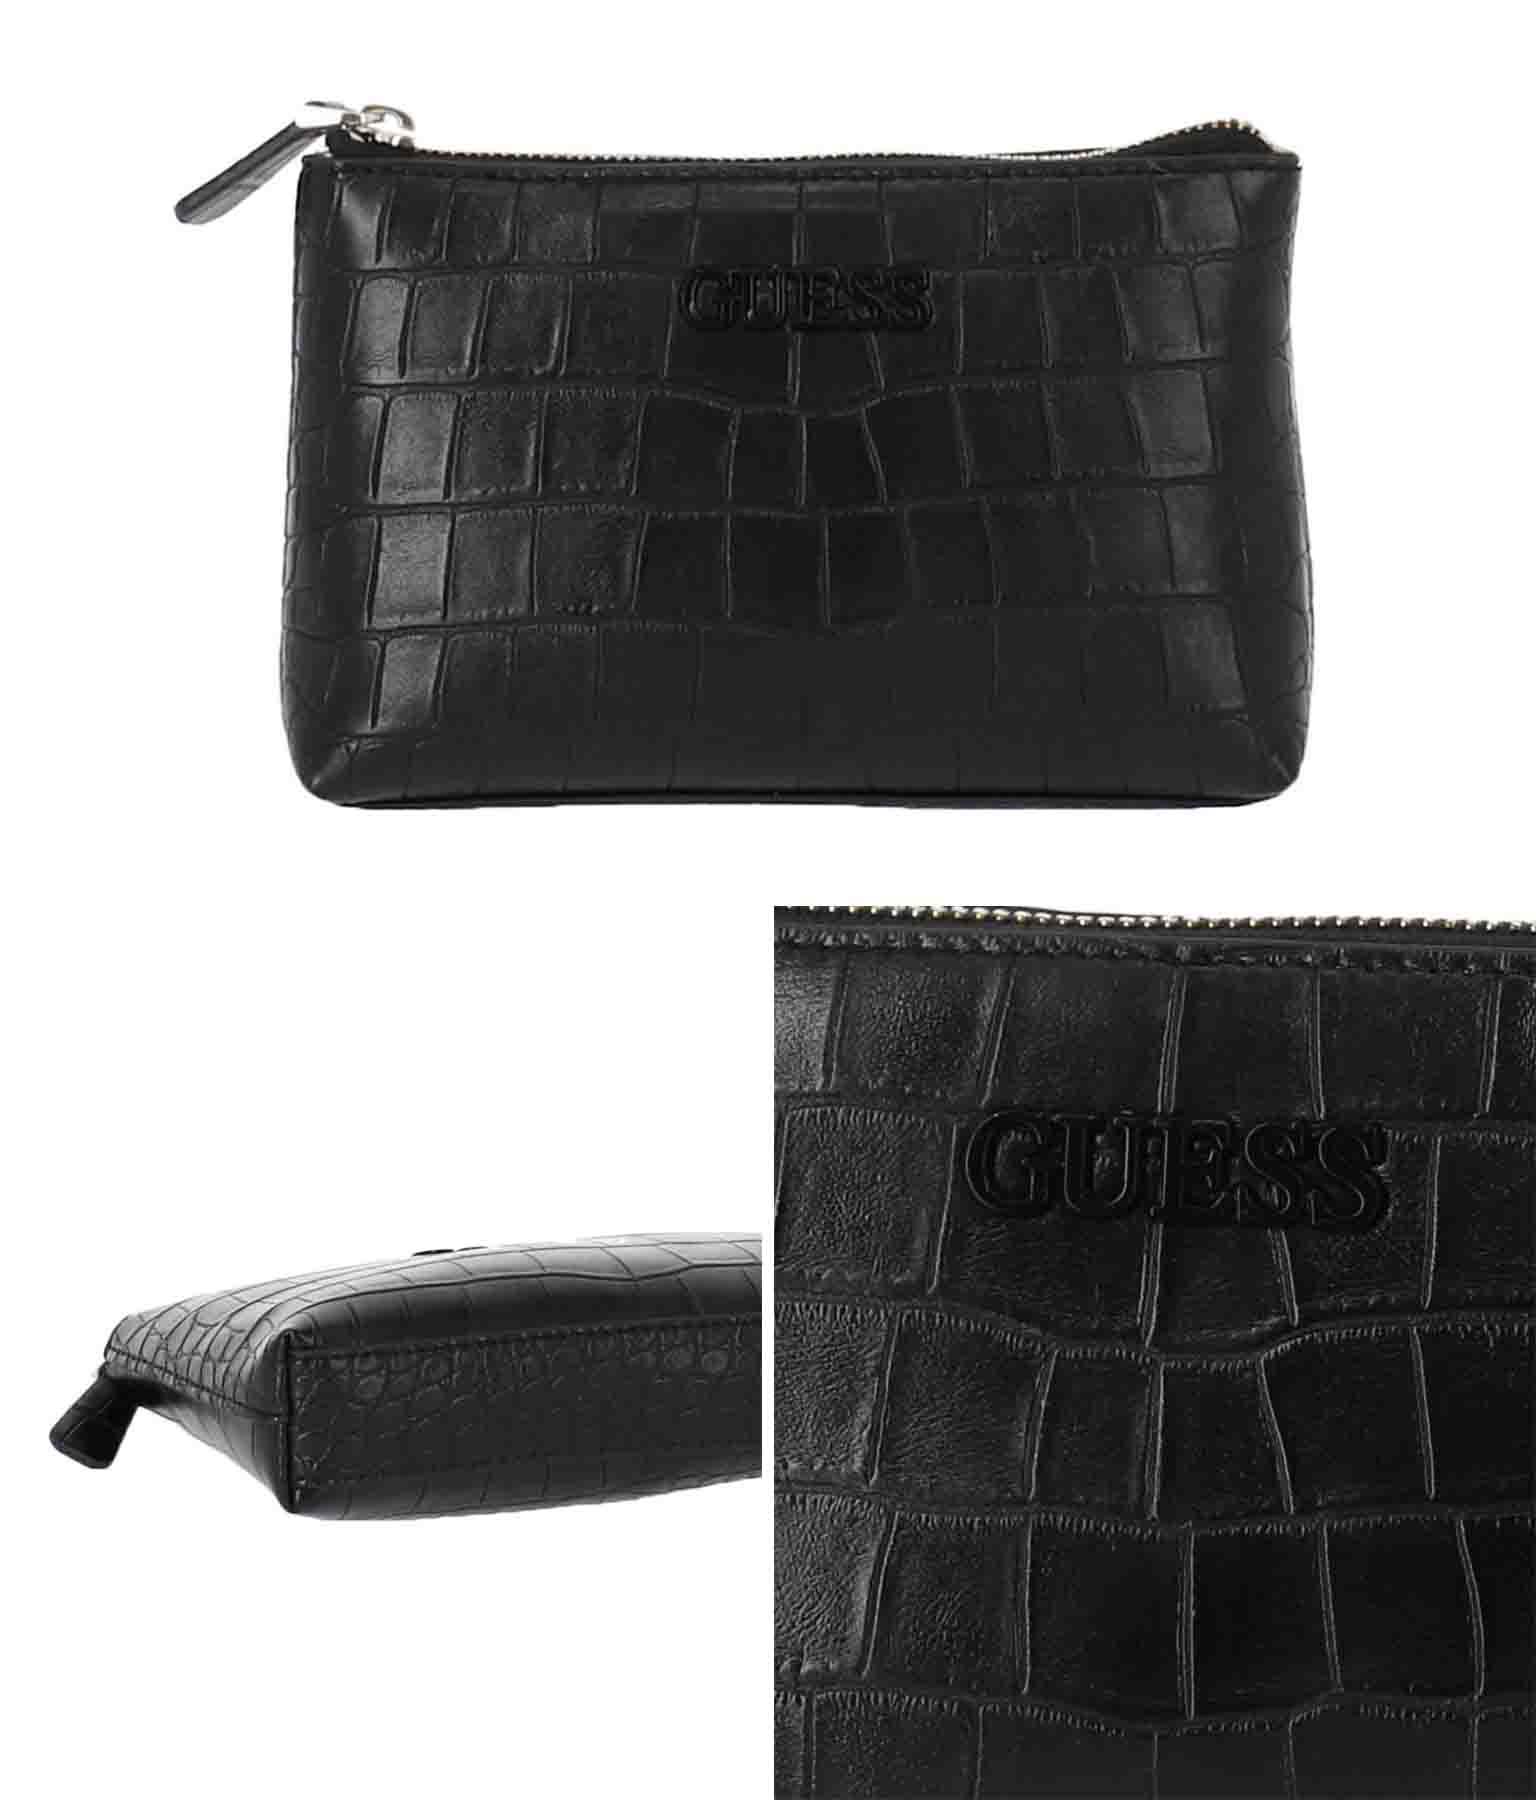 TRIPLE G SMALL TOTE BAG(バッグ・鞄・小物/クリアバッグ・ハンドバッグ・ショルダーバッグ) | GUESS